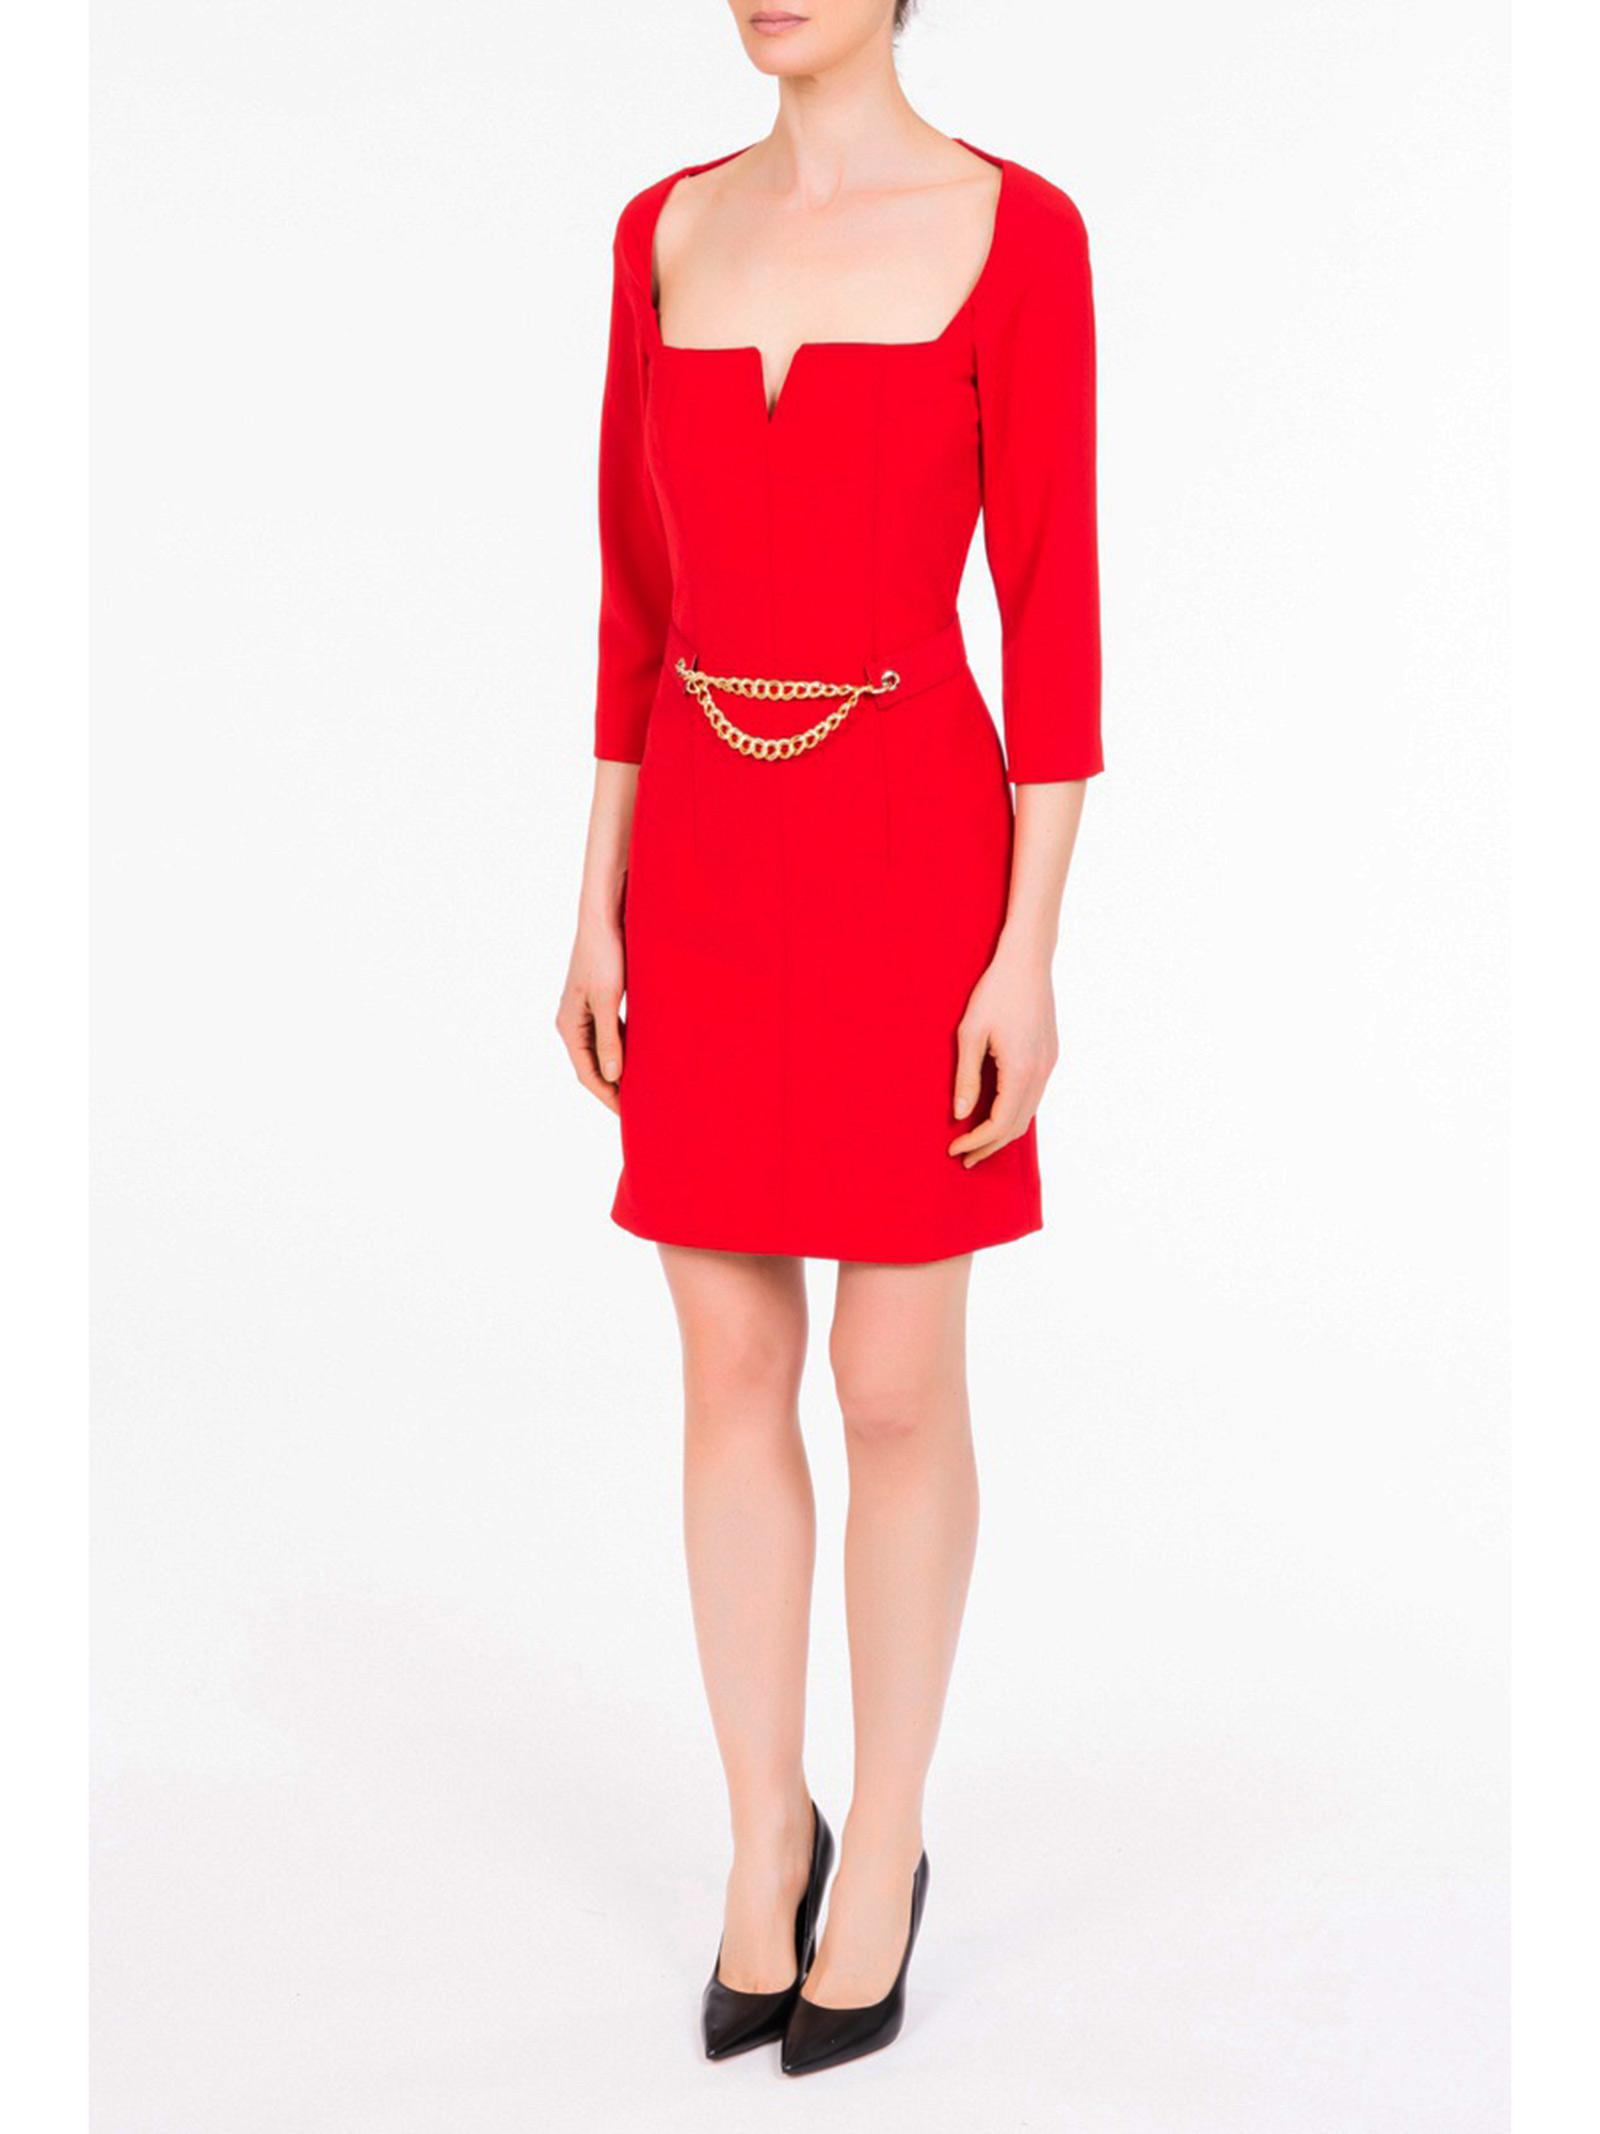 SIMONA CORSELLINI | Dresses | P21CPAB0230499